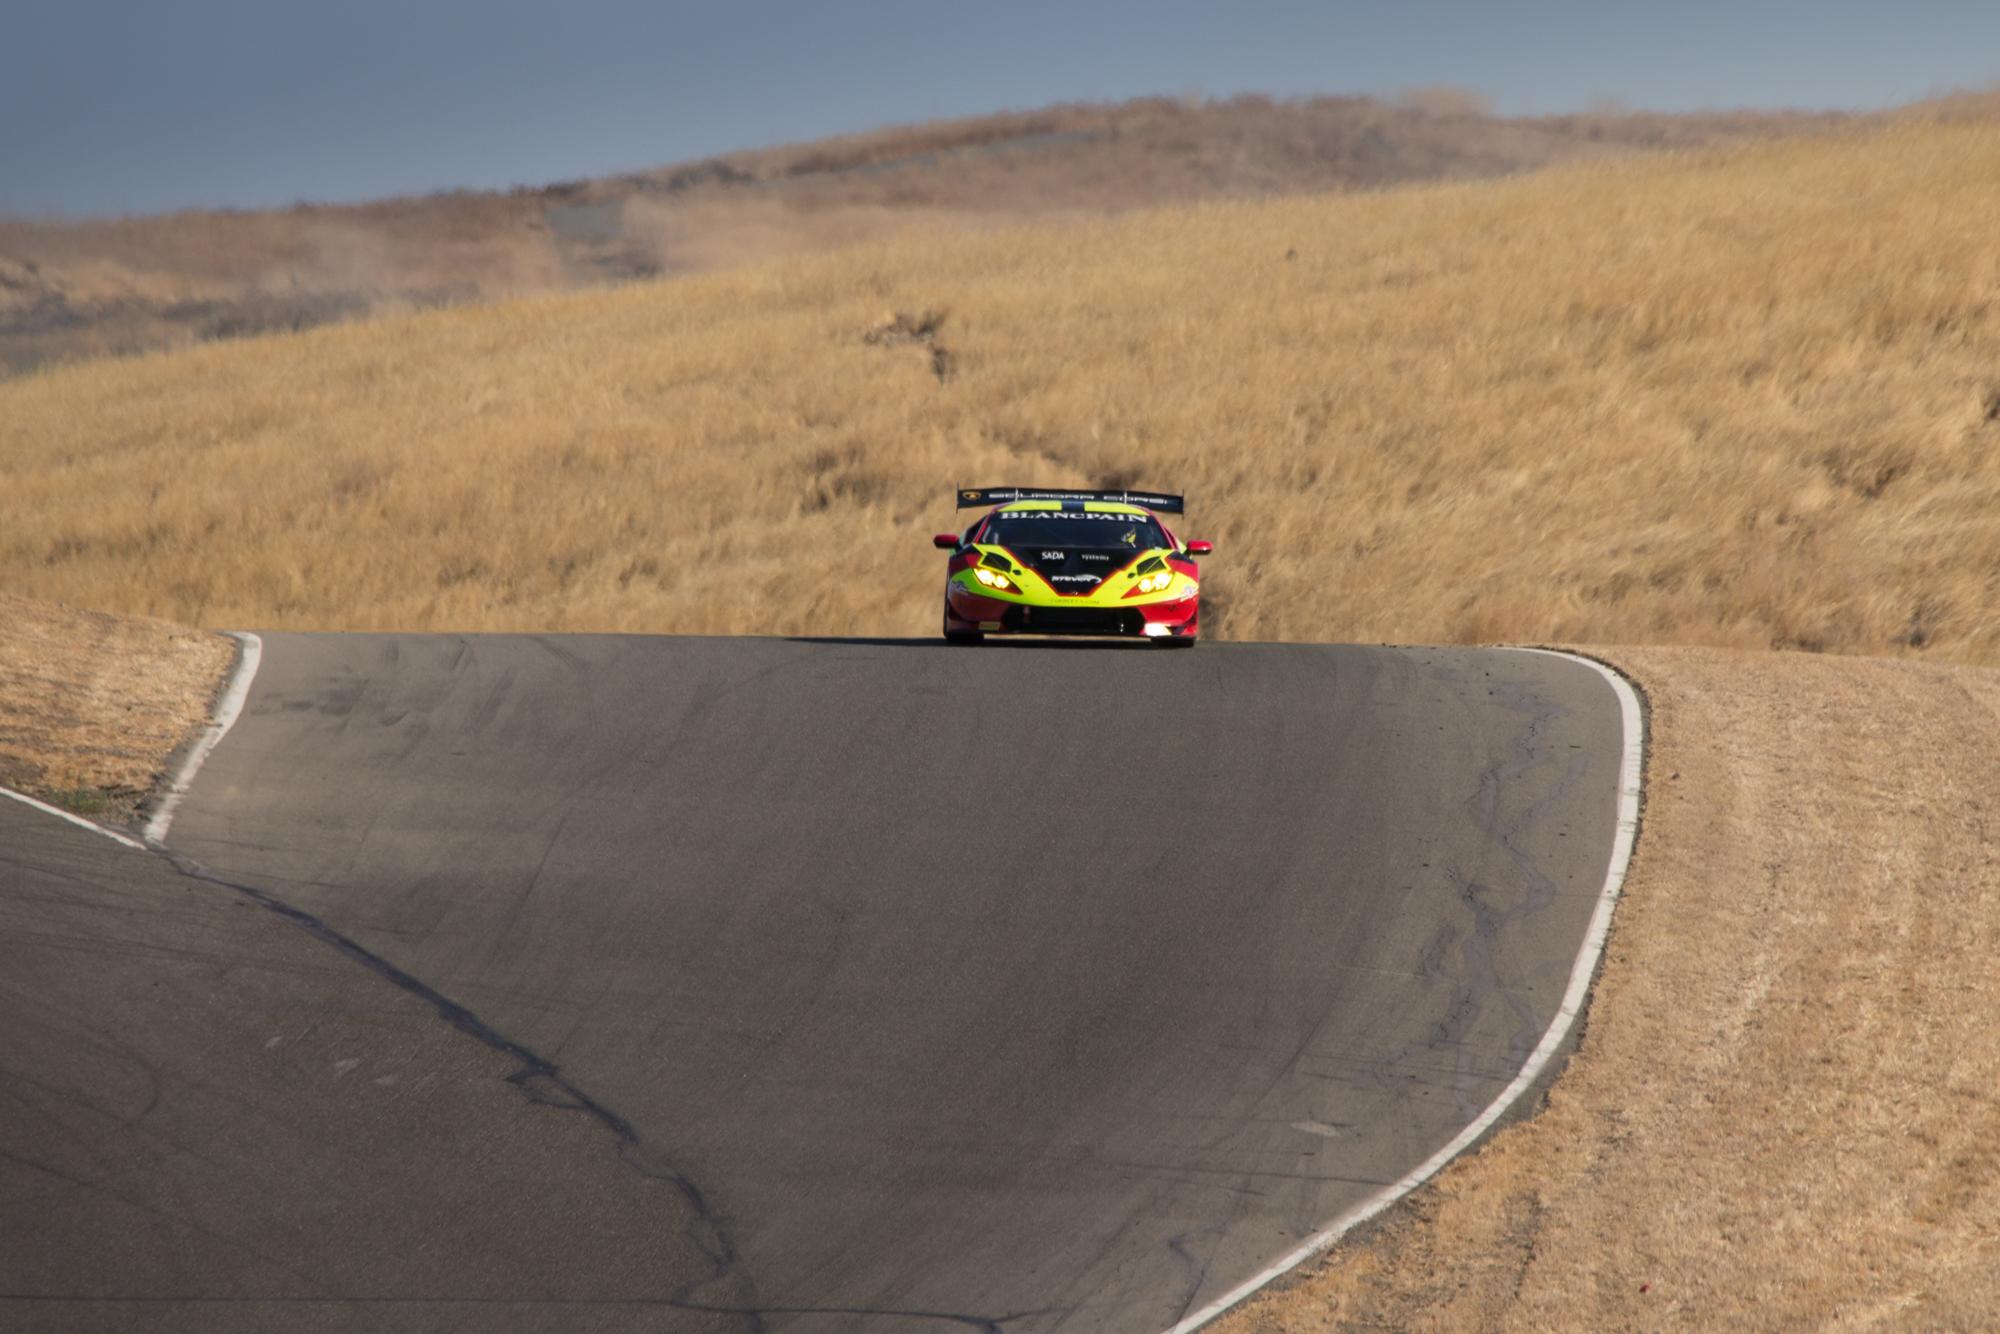 Steven-Racing-20171005-44637.jpg